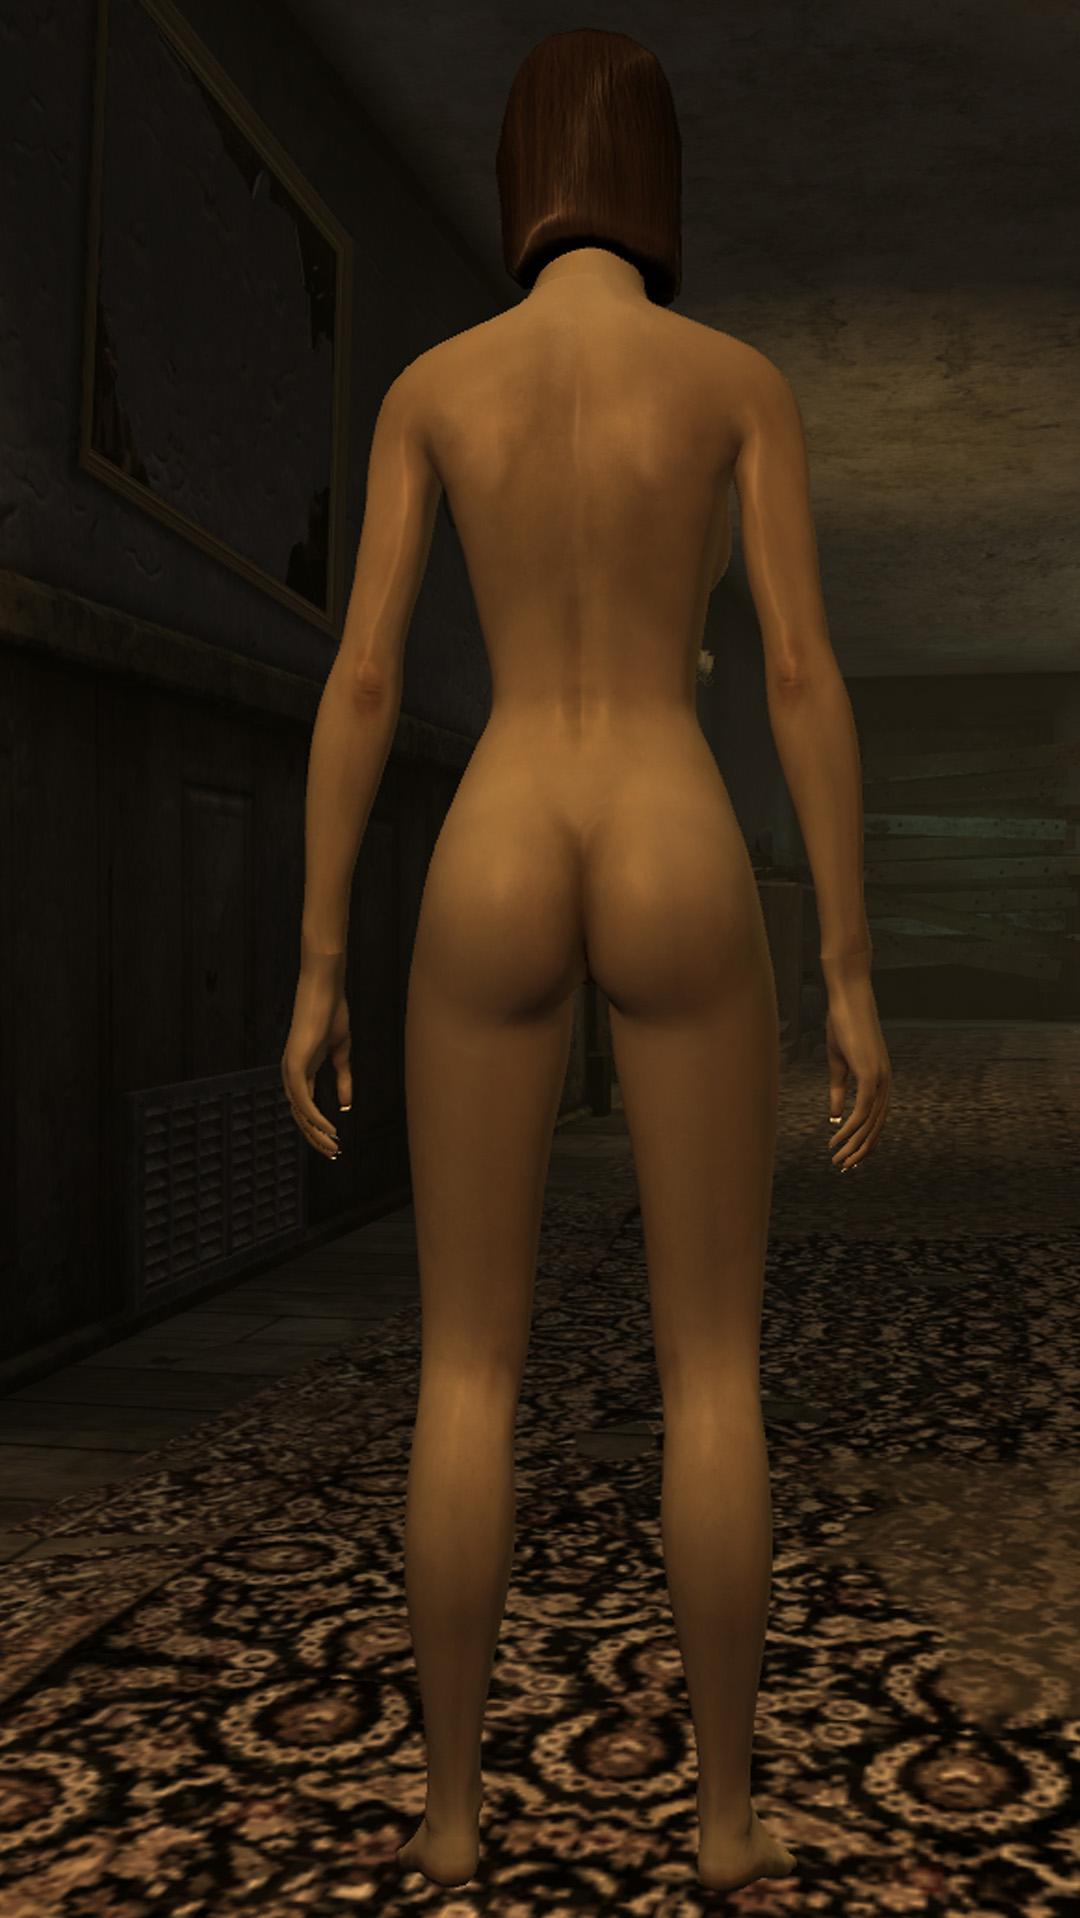 Fallout new vega mode nude porn image